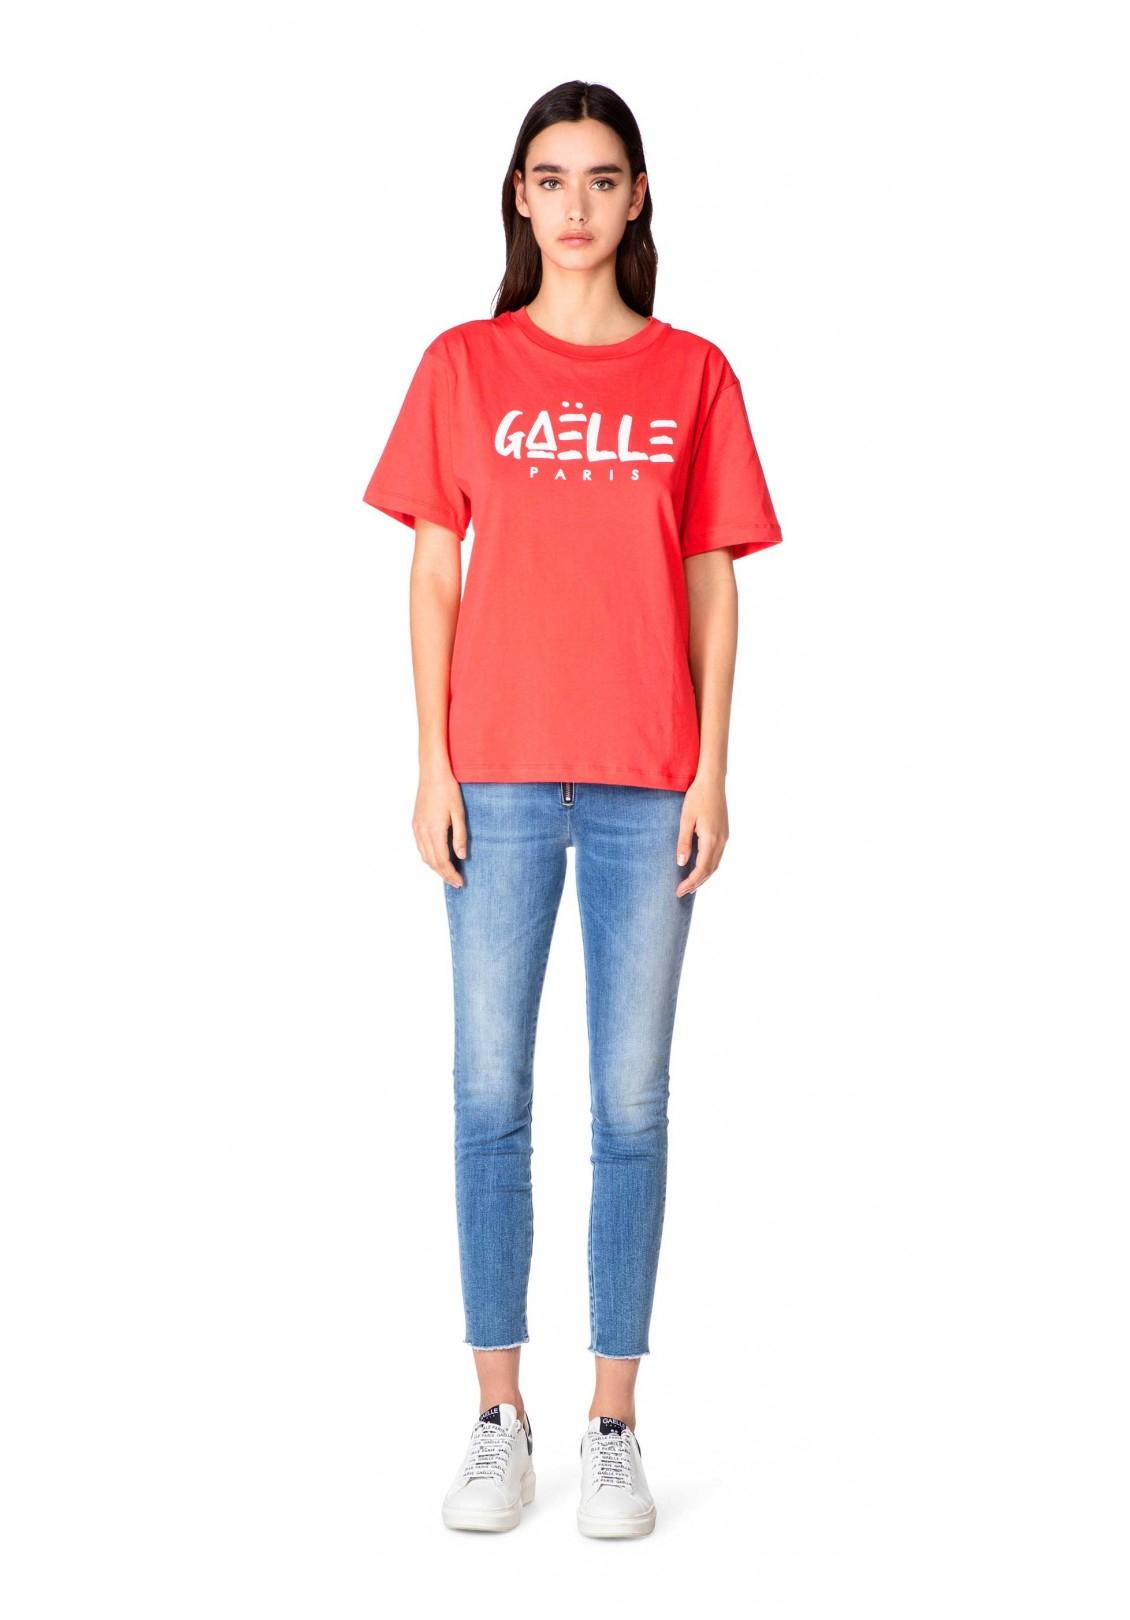 T-shirt rossa con logo gaelle paris